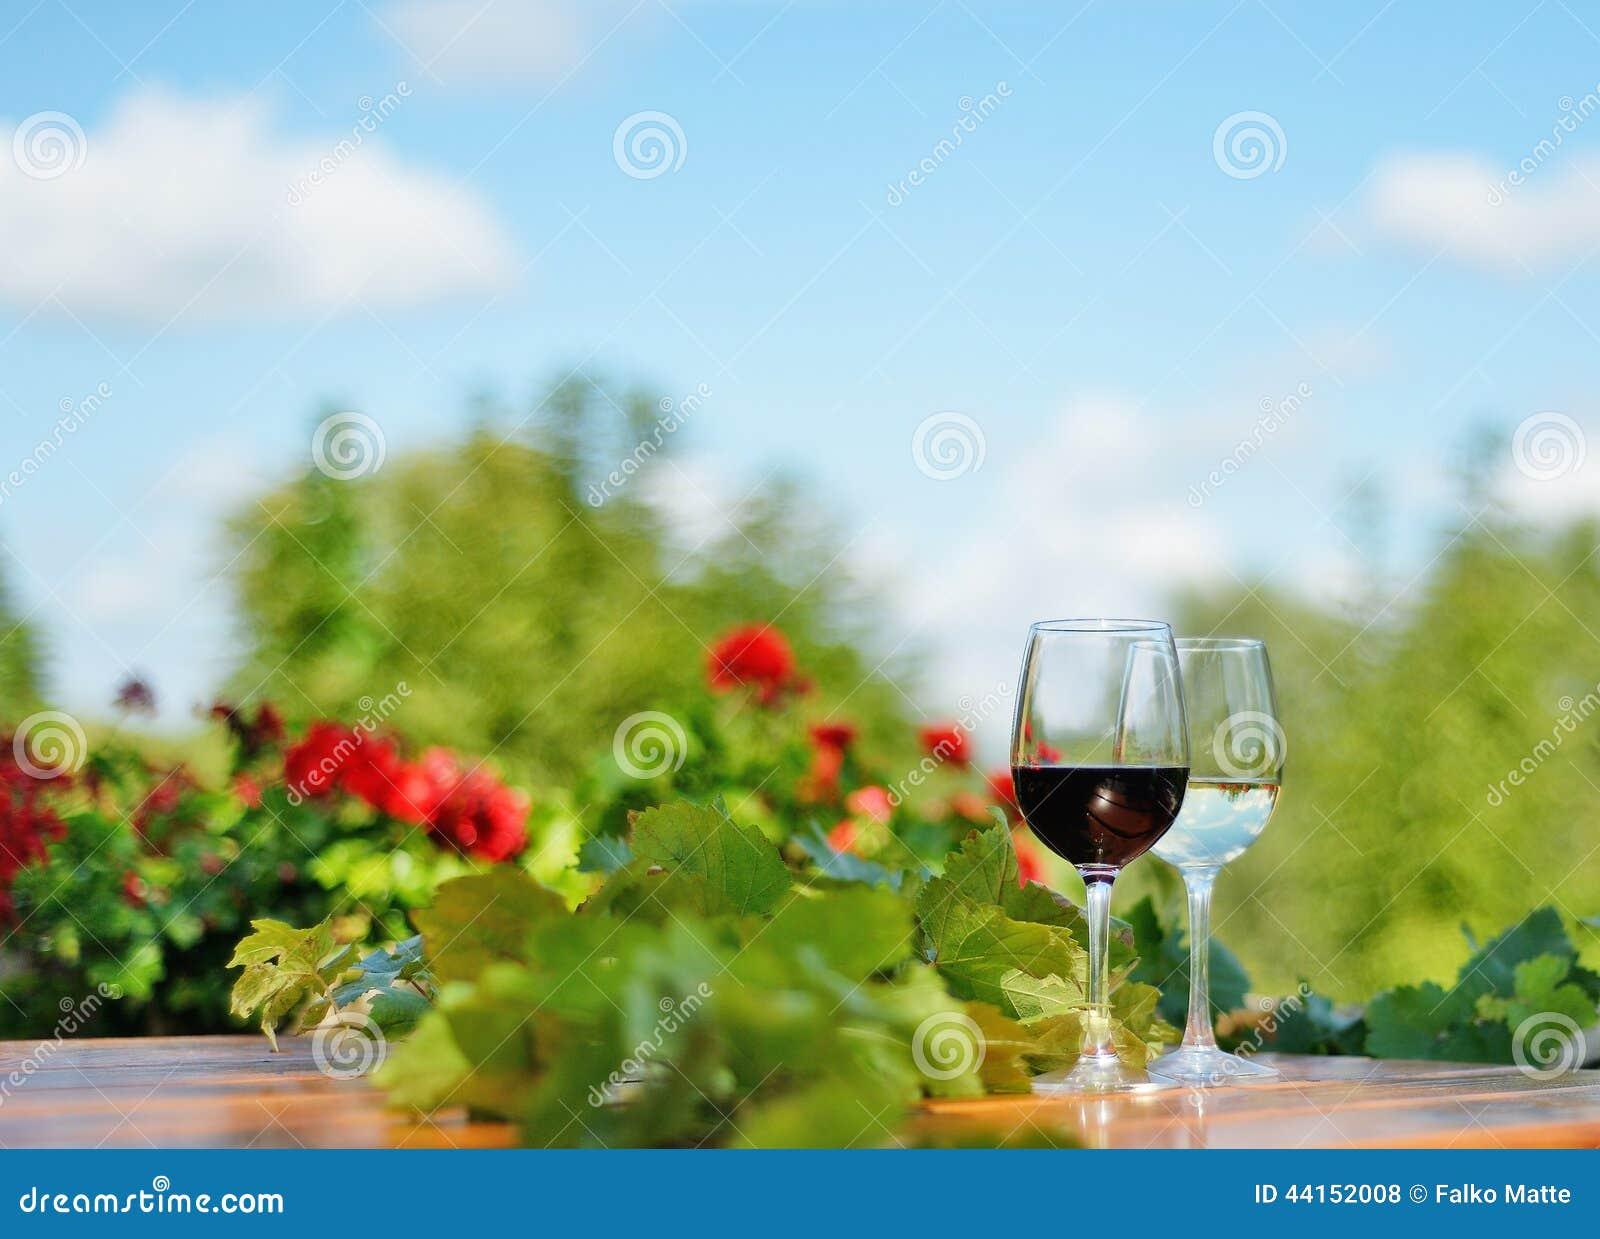 verres de vin rouge et blanc dehors photo stock image 44152008. Black Bedroom Furniture Sets. Home Design Ideas